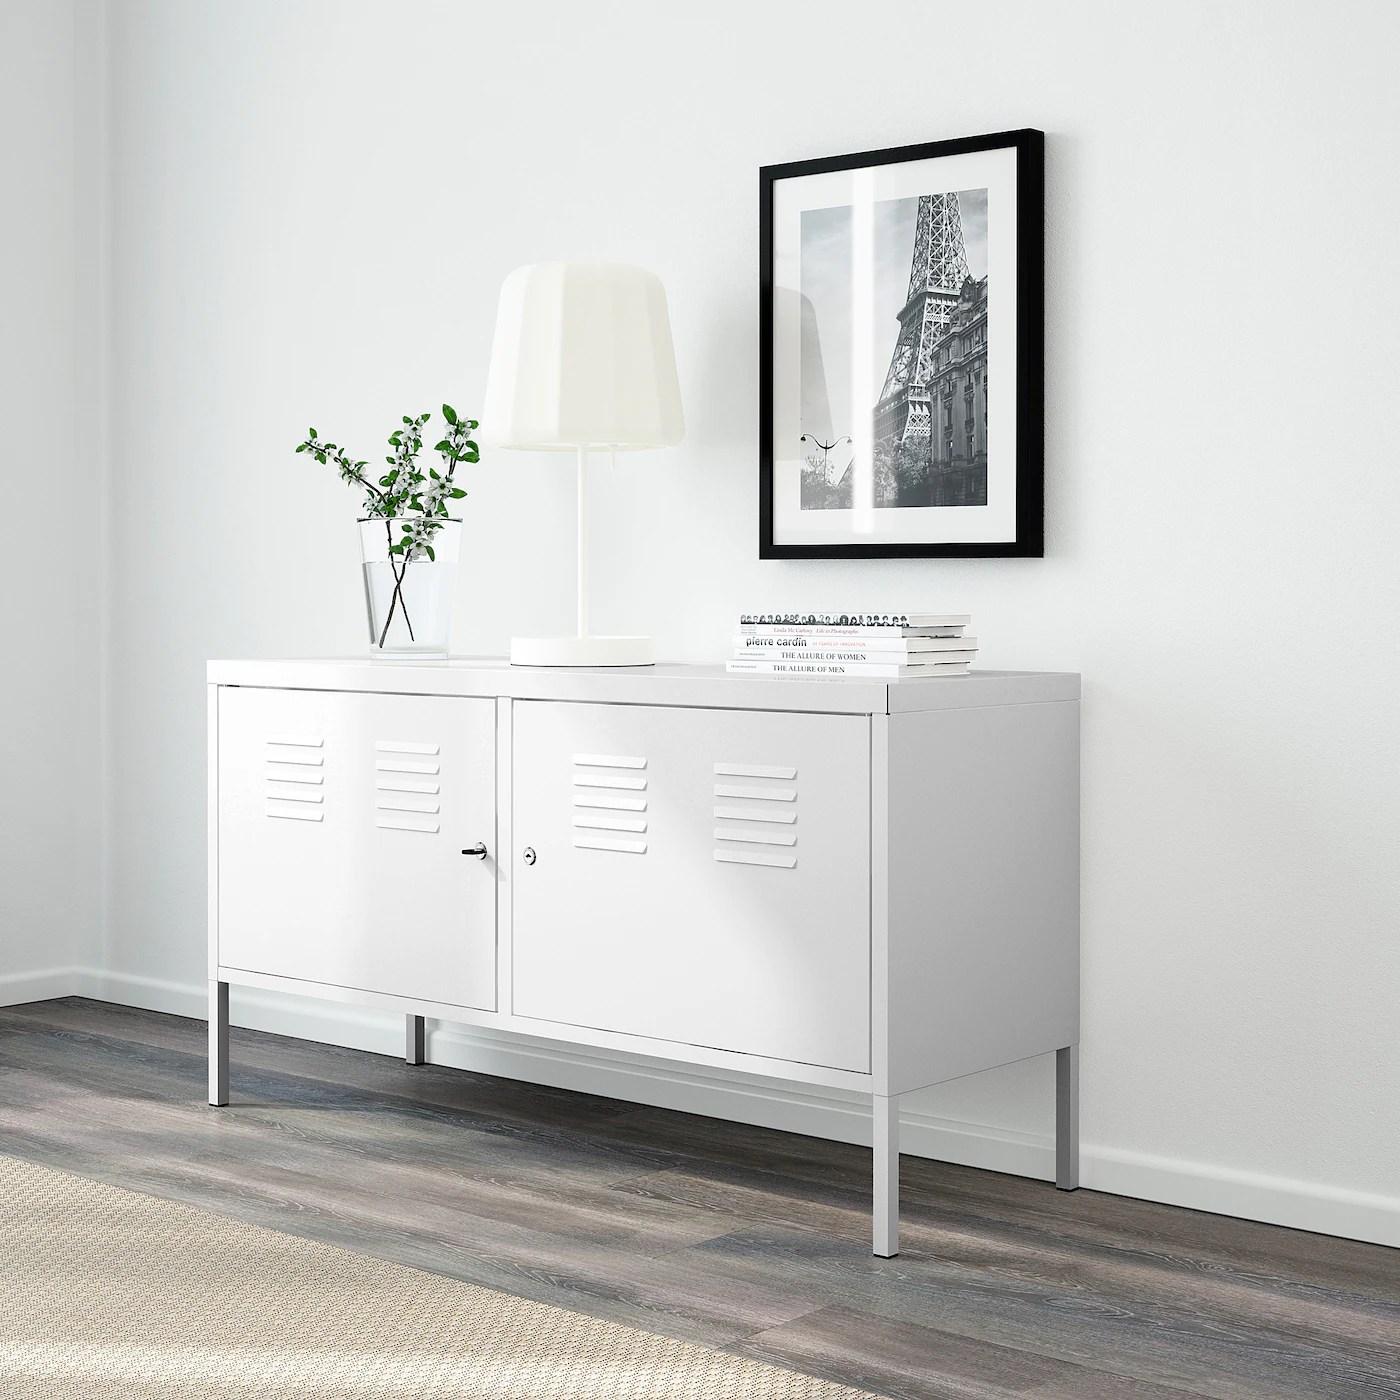 ikea ps armoire metallique blanc 46 7 8x24 3 4 119x63 cm